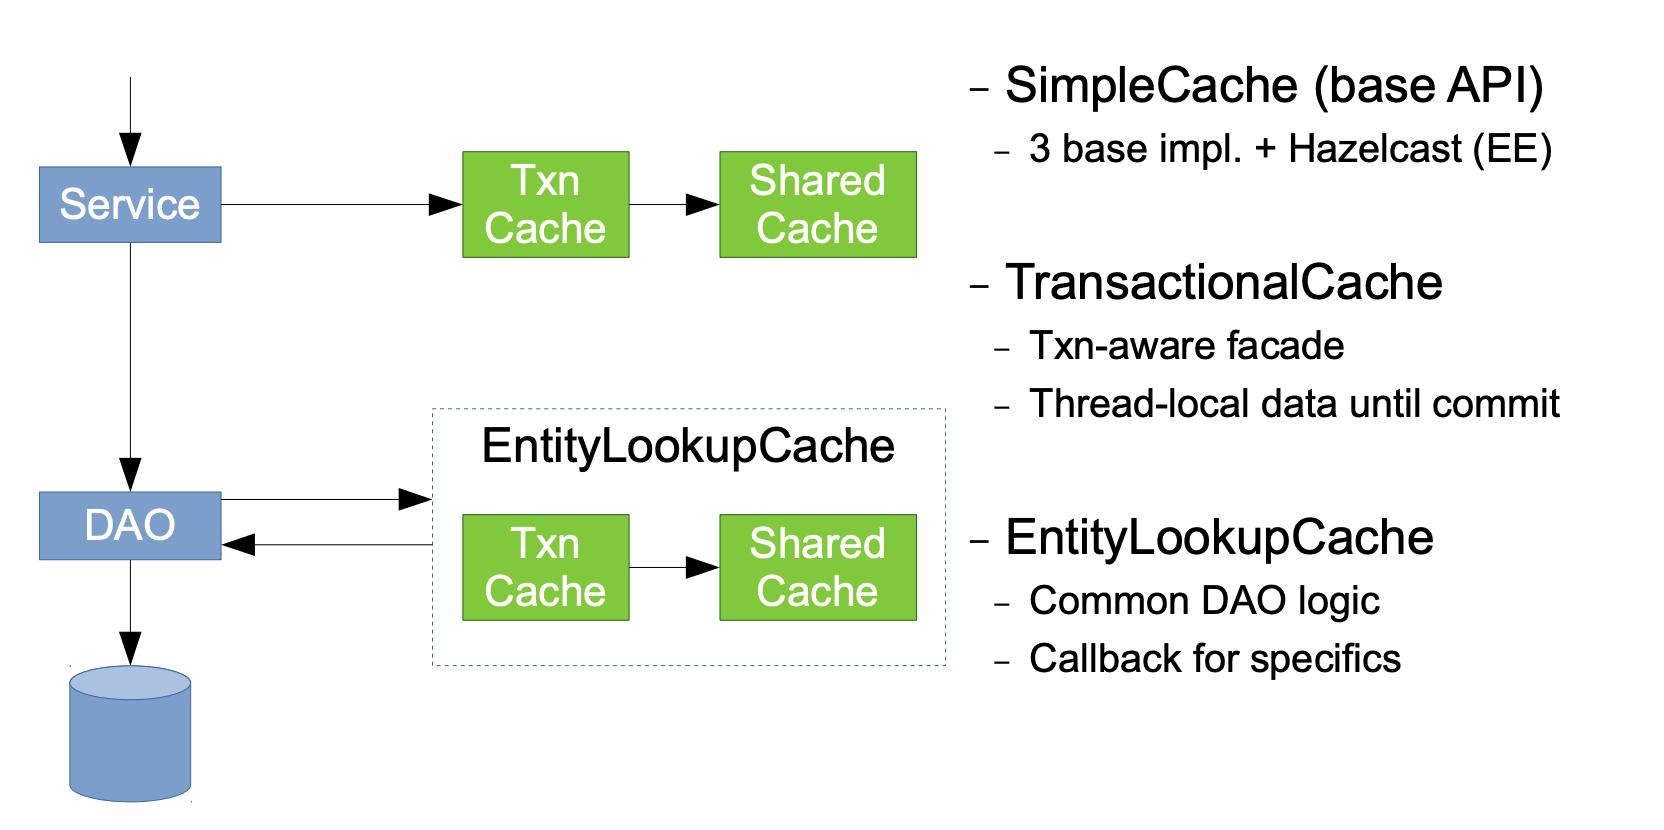 L1 = The transactional cache